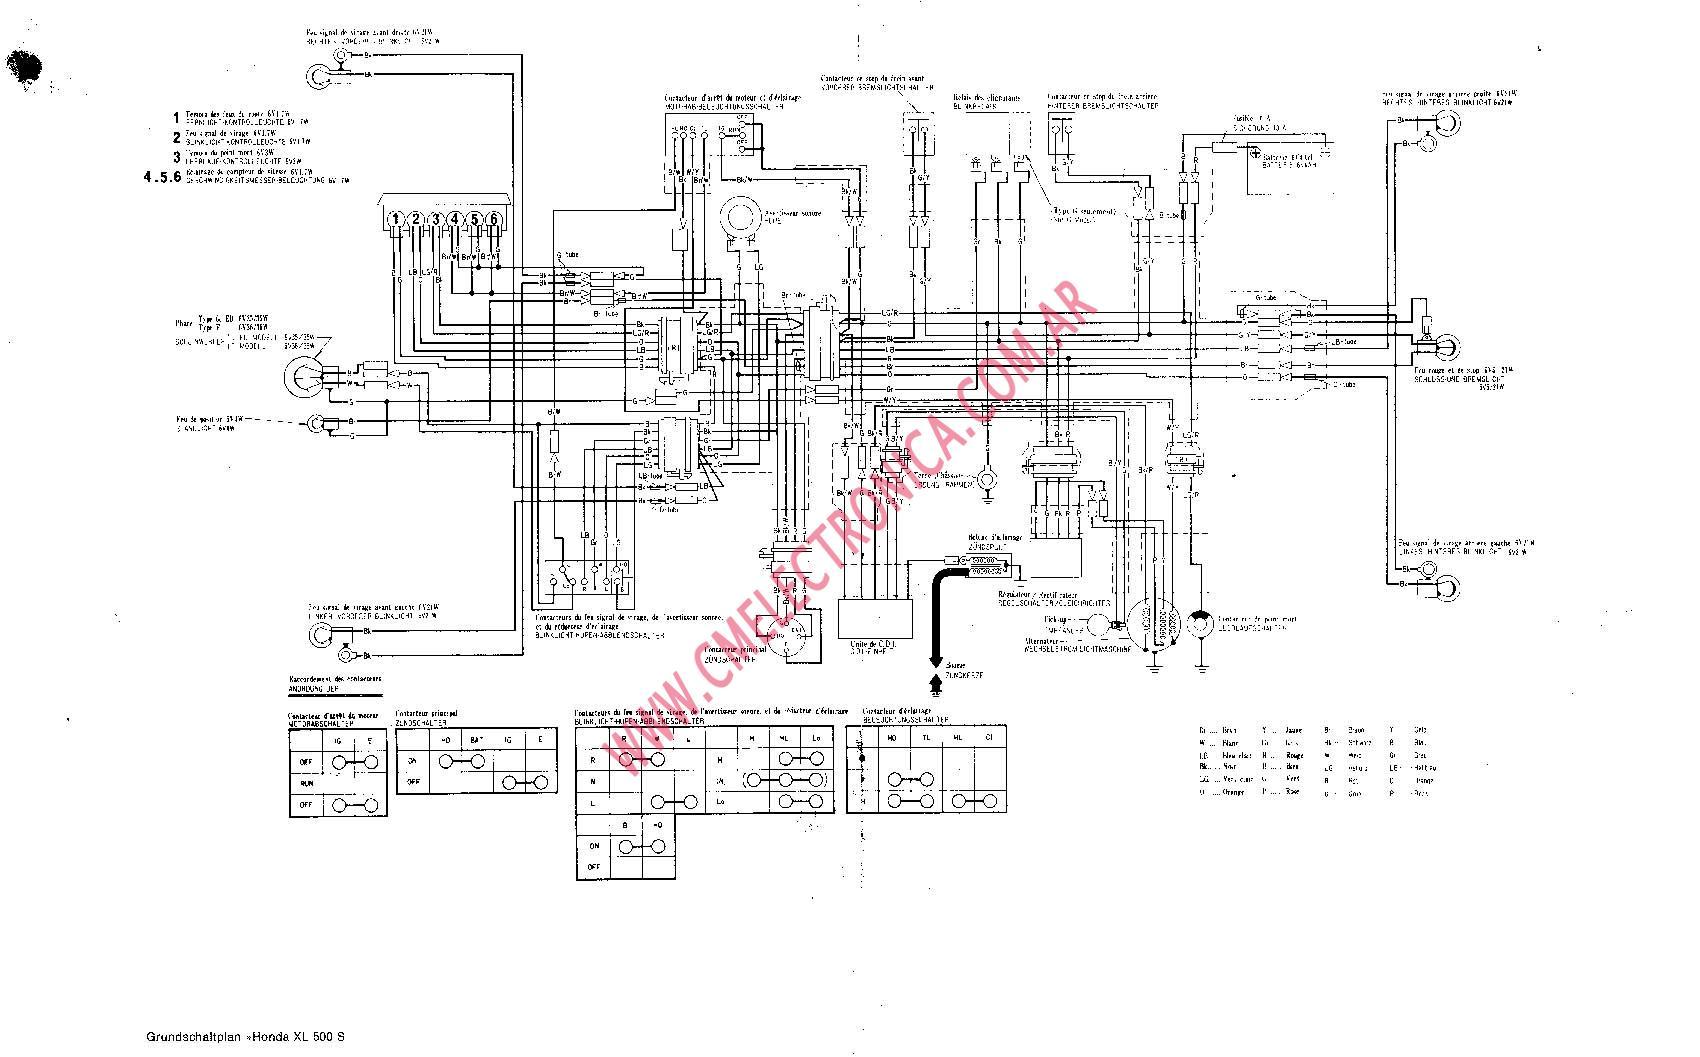 1979 honda xl500s wiring diagram